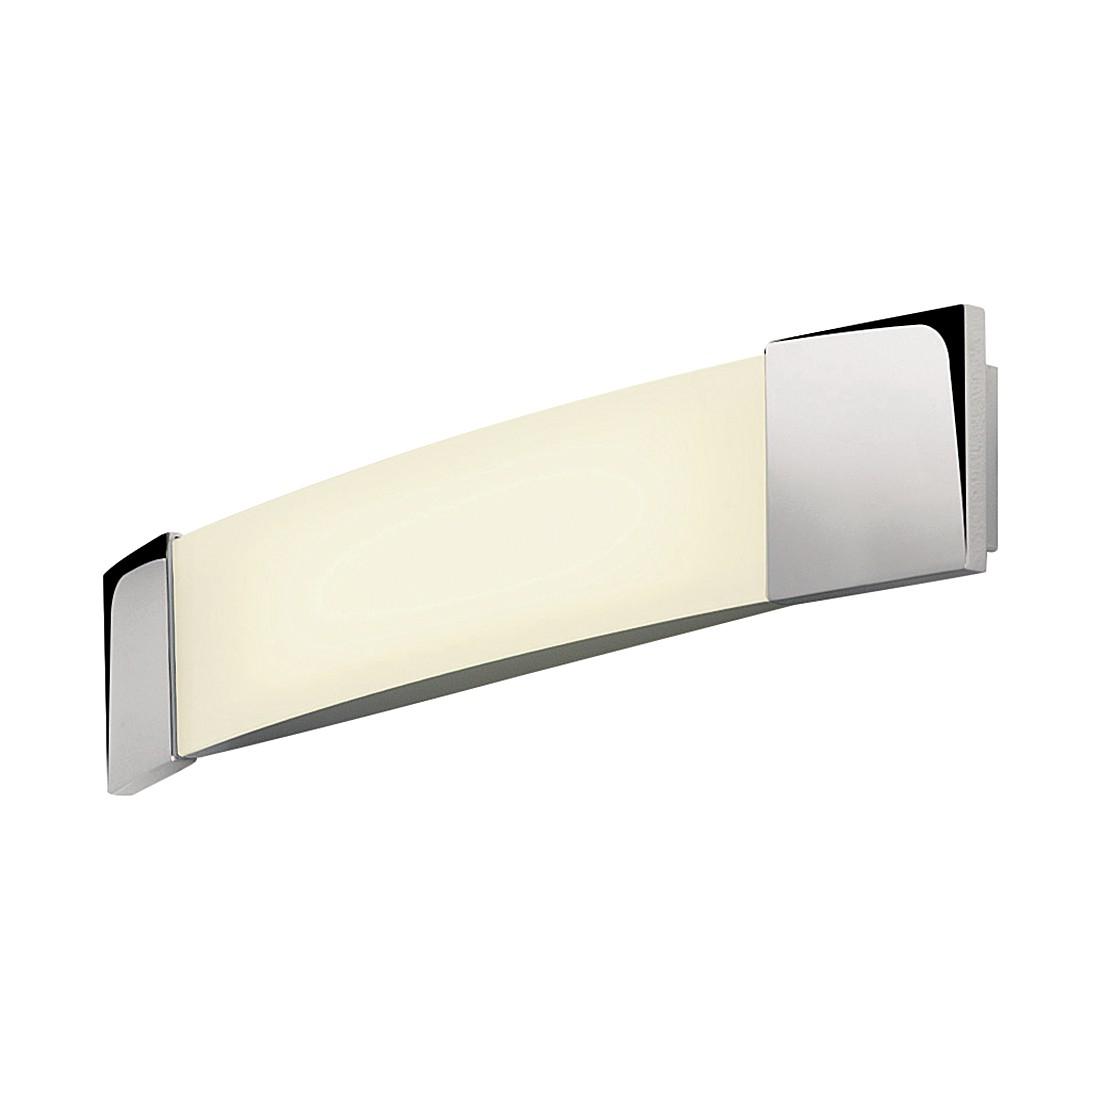 Badleuchte Bow Plus – Chrom – 2-flammig, Astro jetzt kaufen